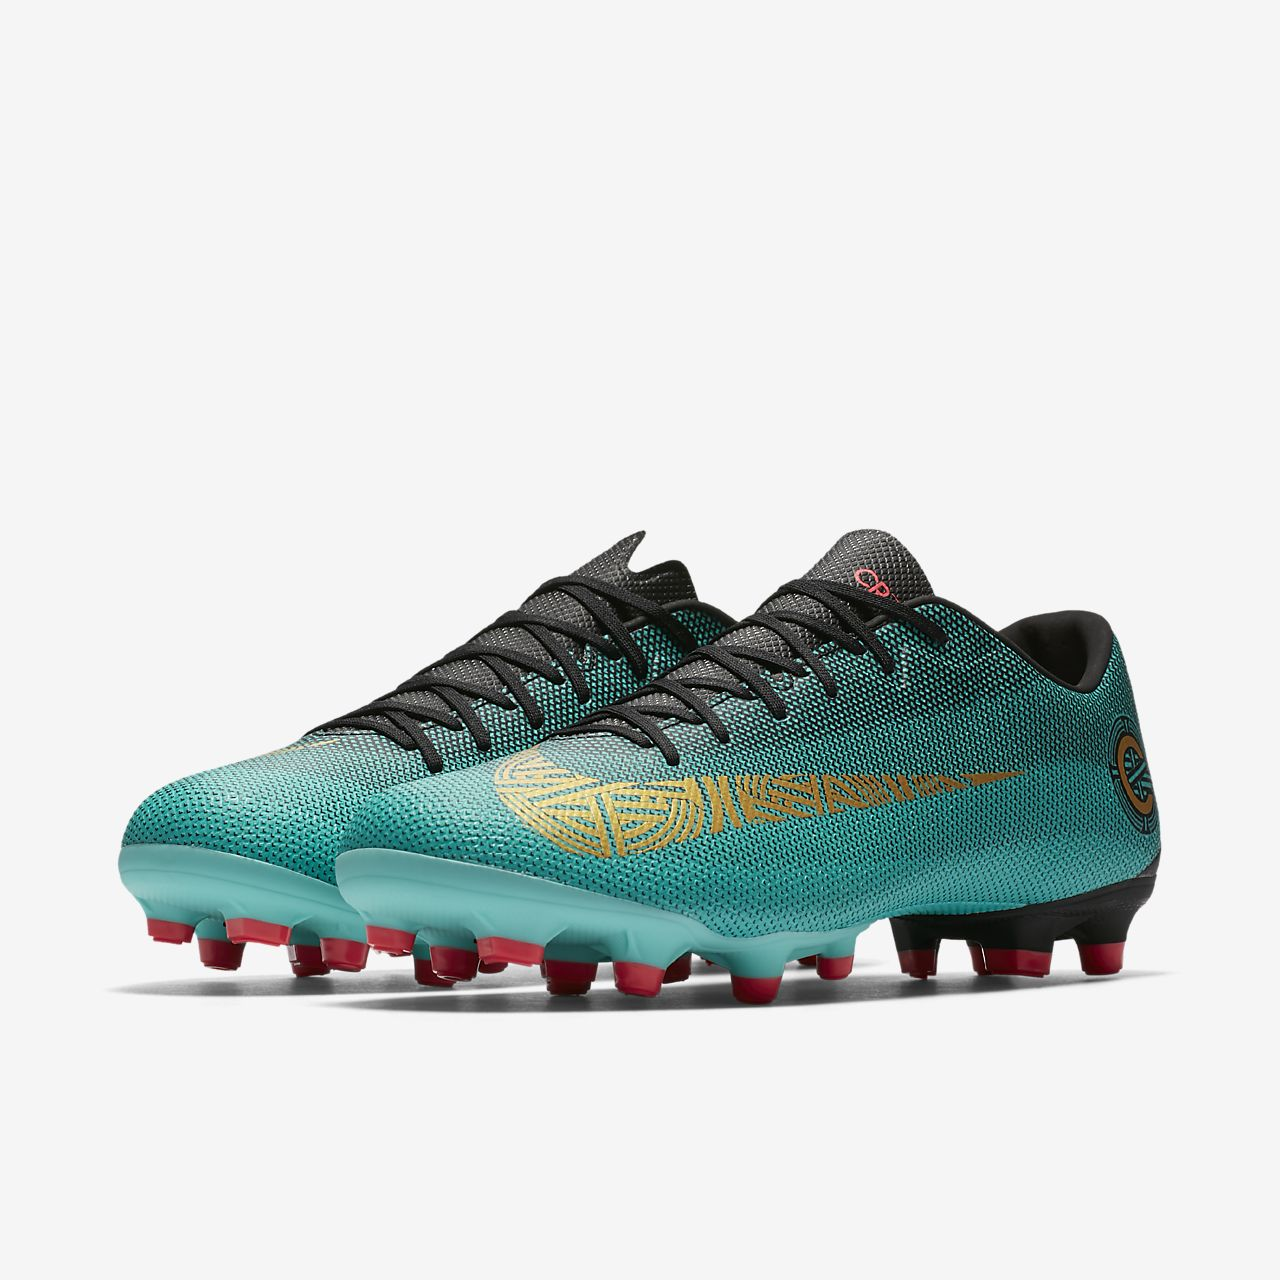 Acquista 2 OFF QUALSIASI scarpe da calcio nike mercurial 2018 CASE E ... cbf63ae57fb